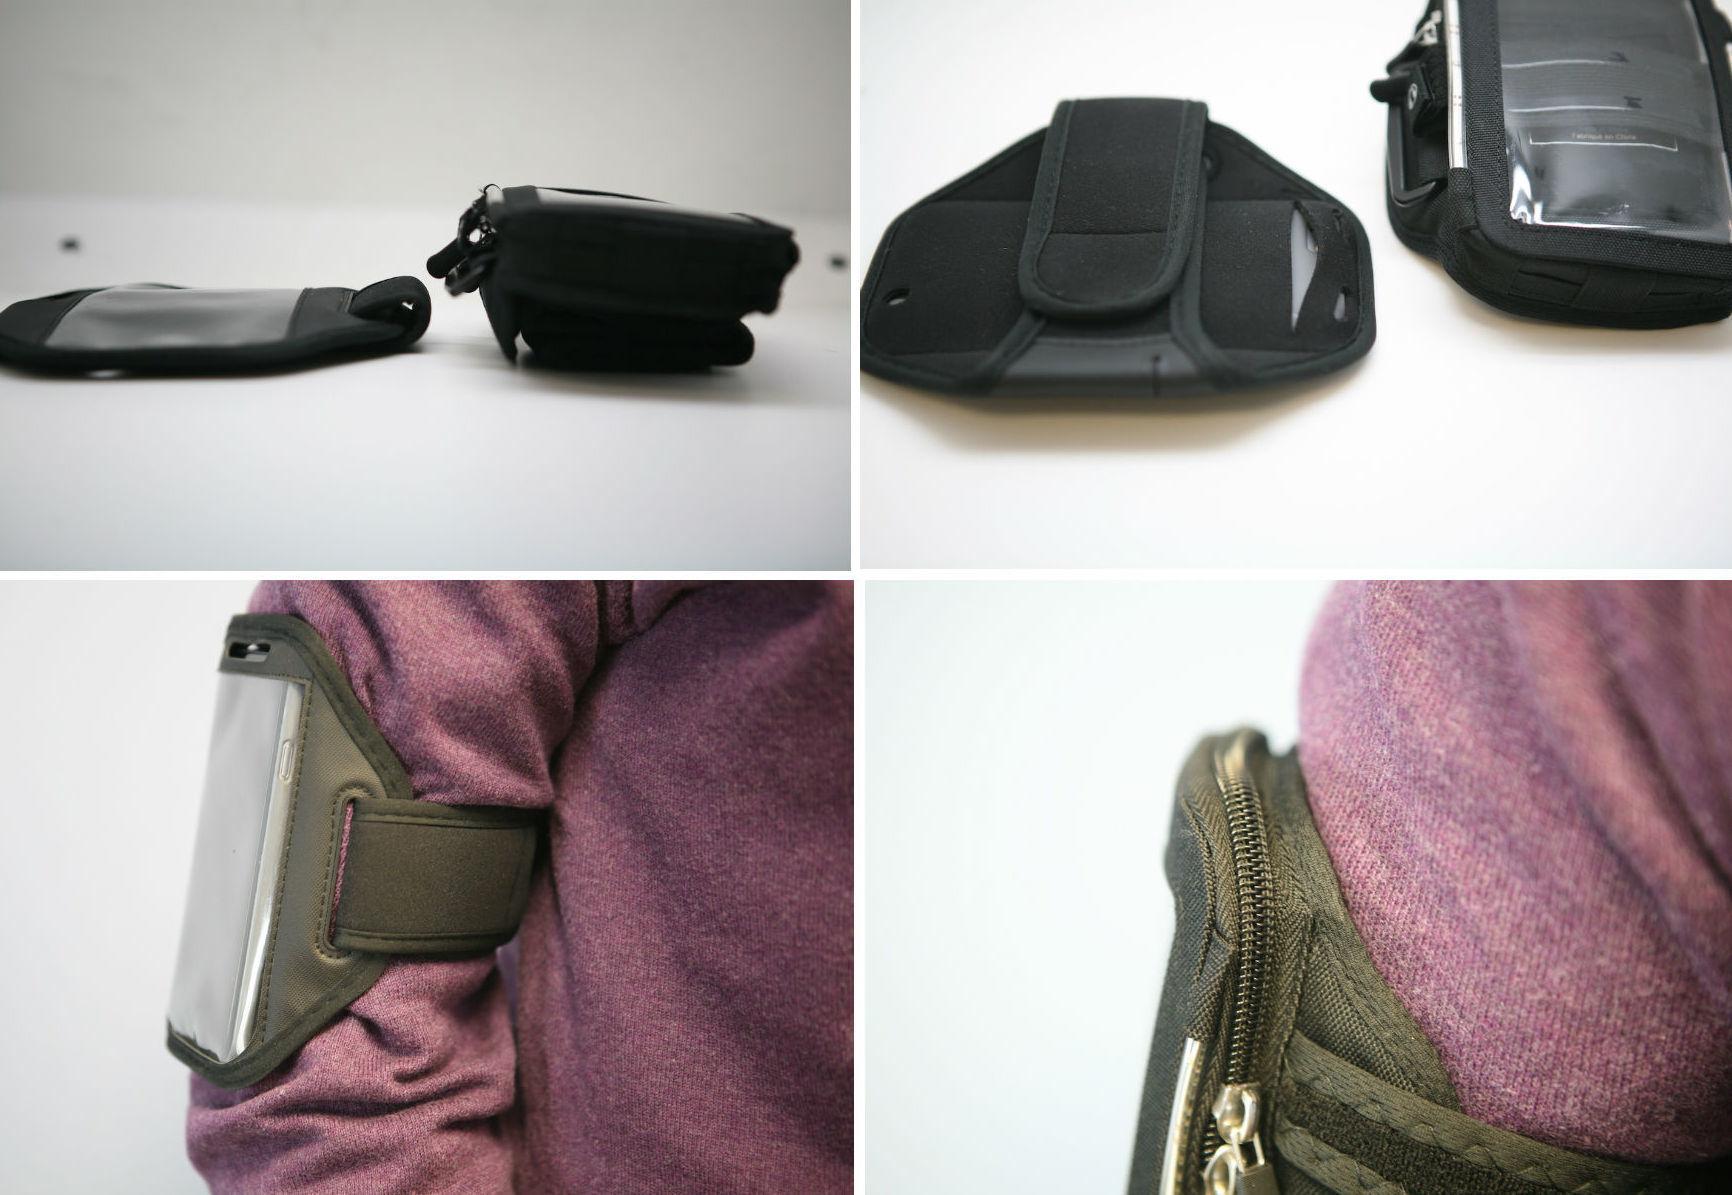 Сверкающий чехол для смартфонов: знакомимся с брендом Armpocket - 6